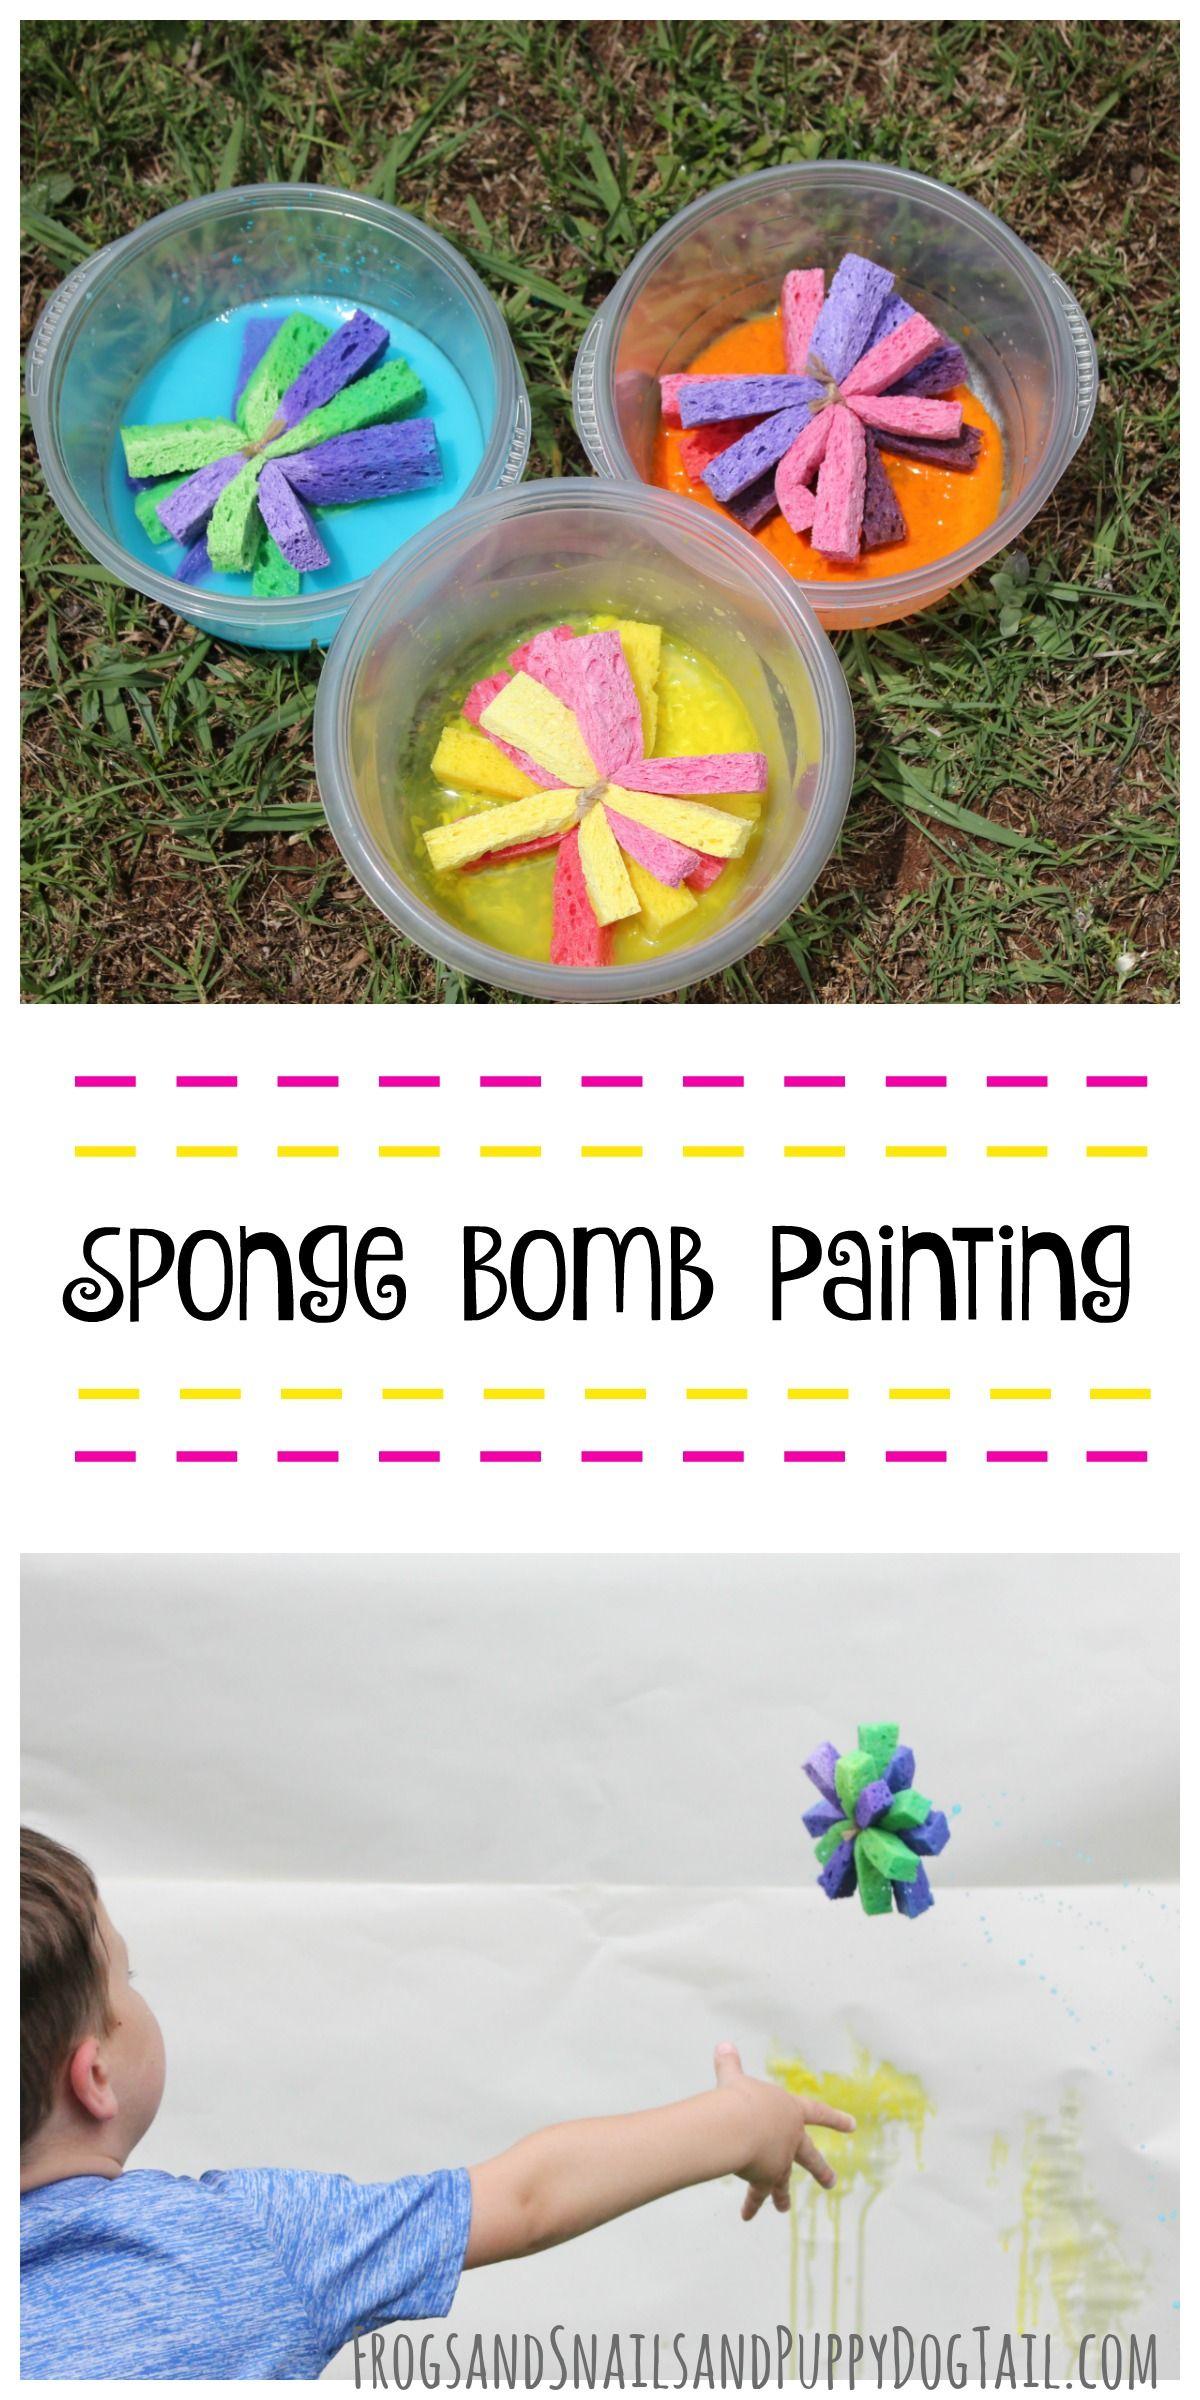 Sponge Bomb Painting | AWESOME ACTIVITIES | Sensory art